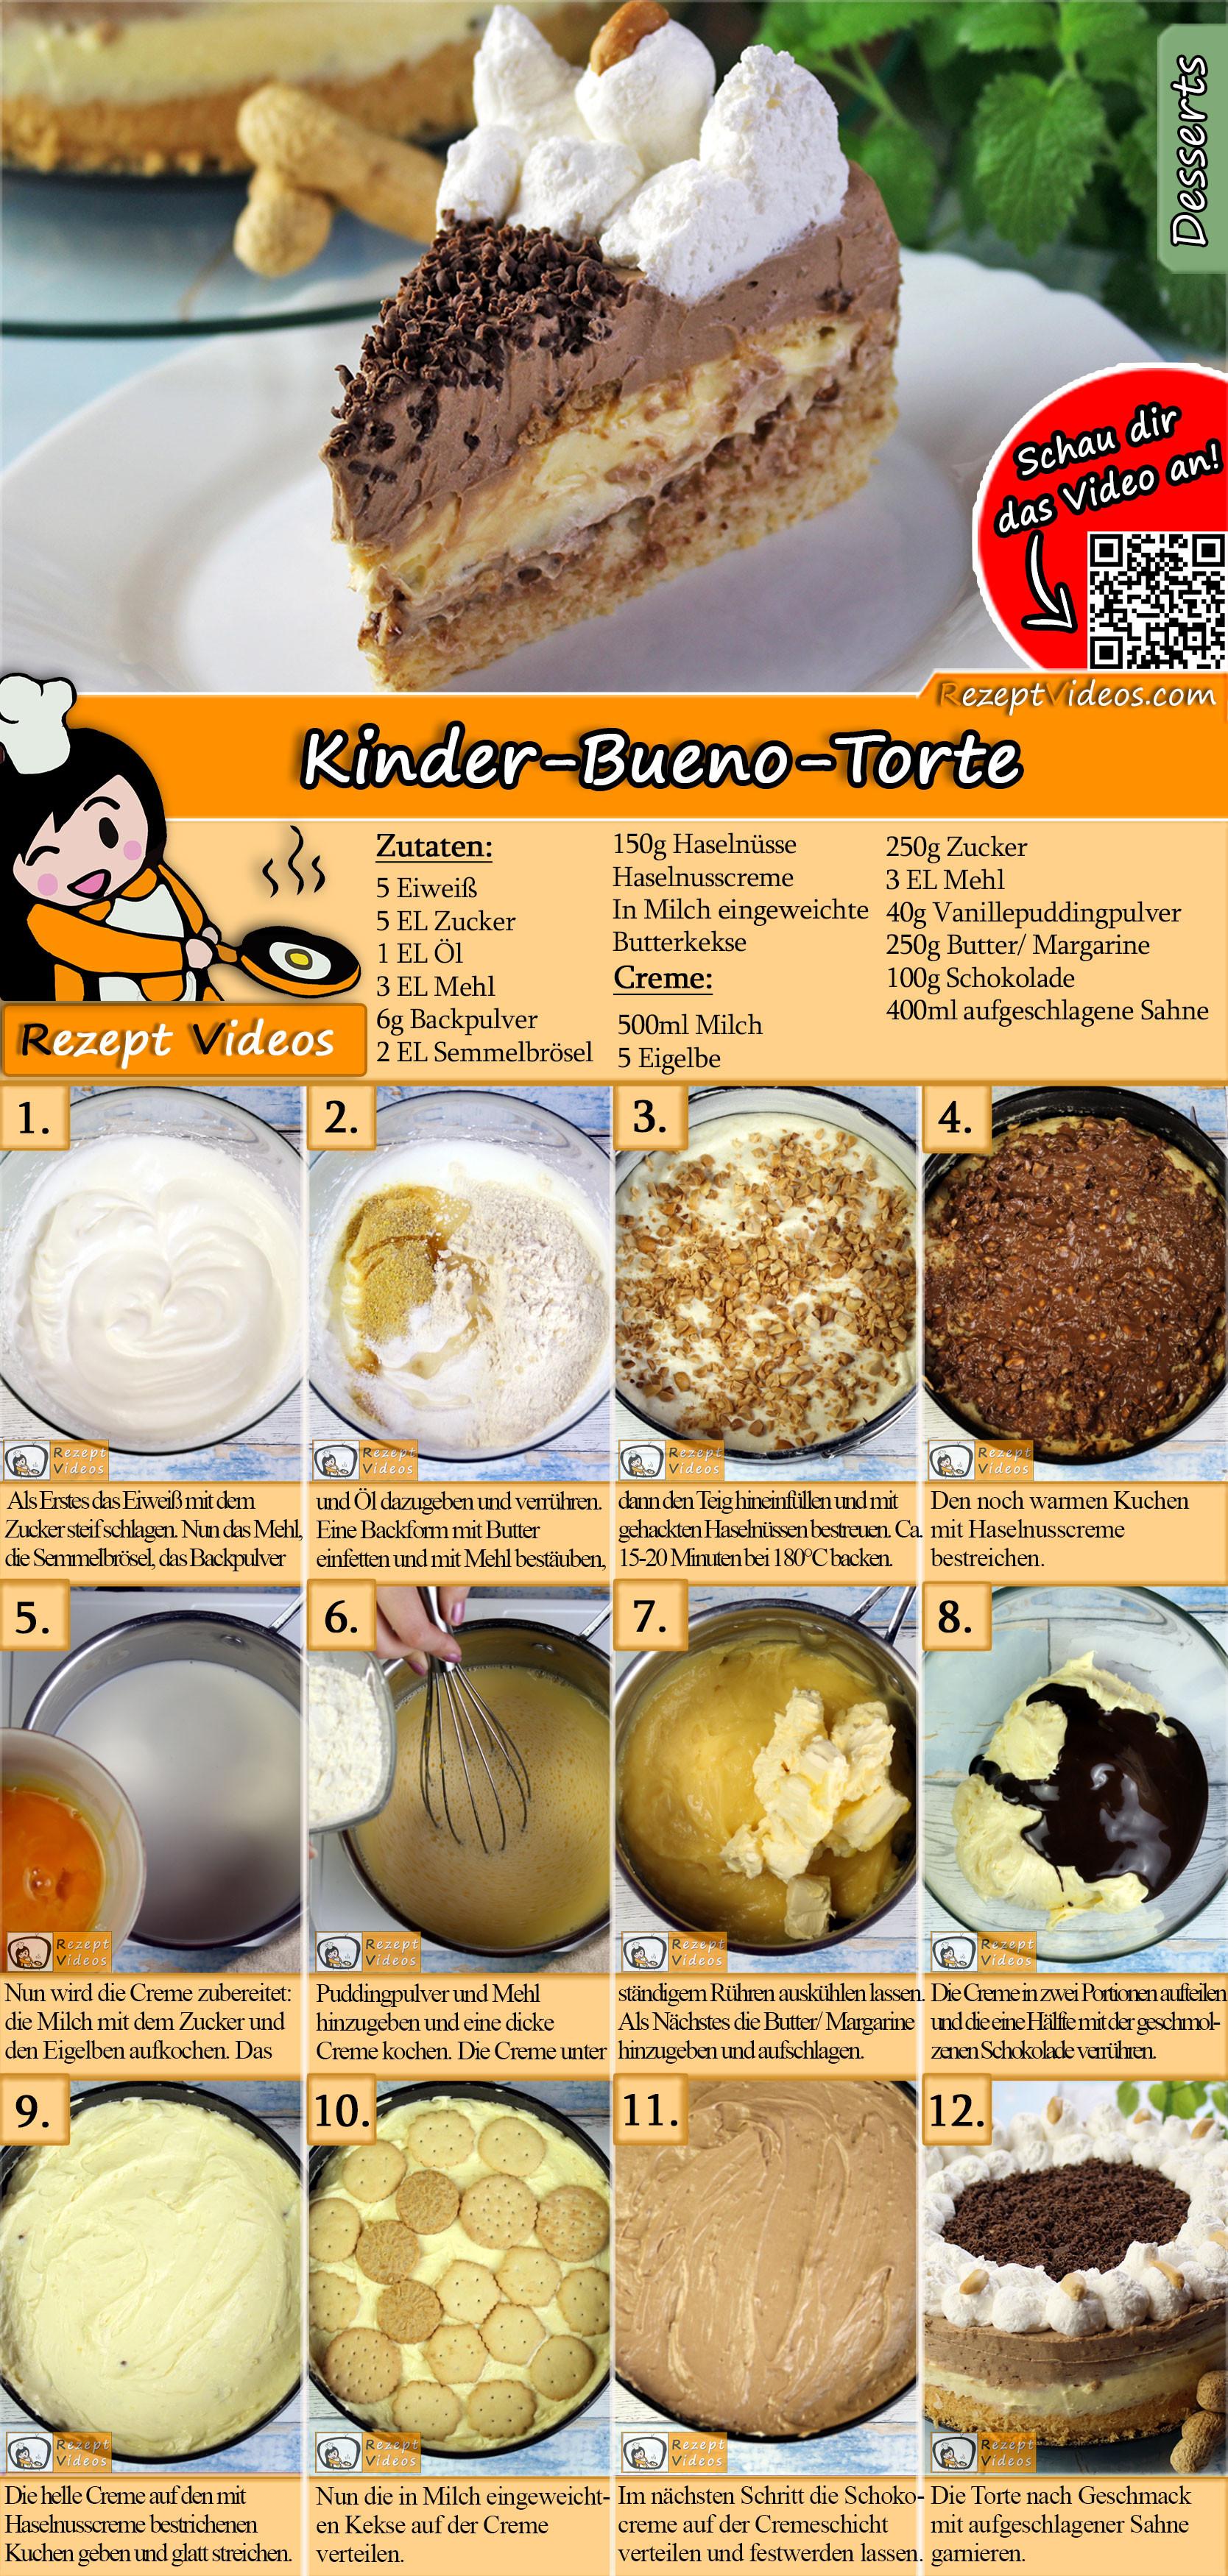 Kinder Bueno Torte Rezept Mit Video Leckere Torten Rezepte